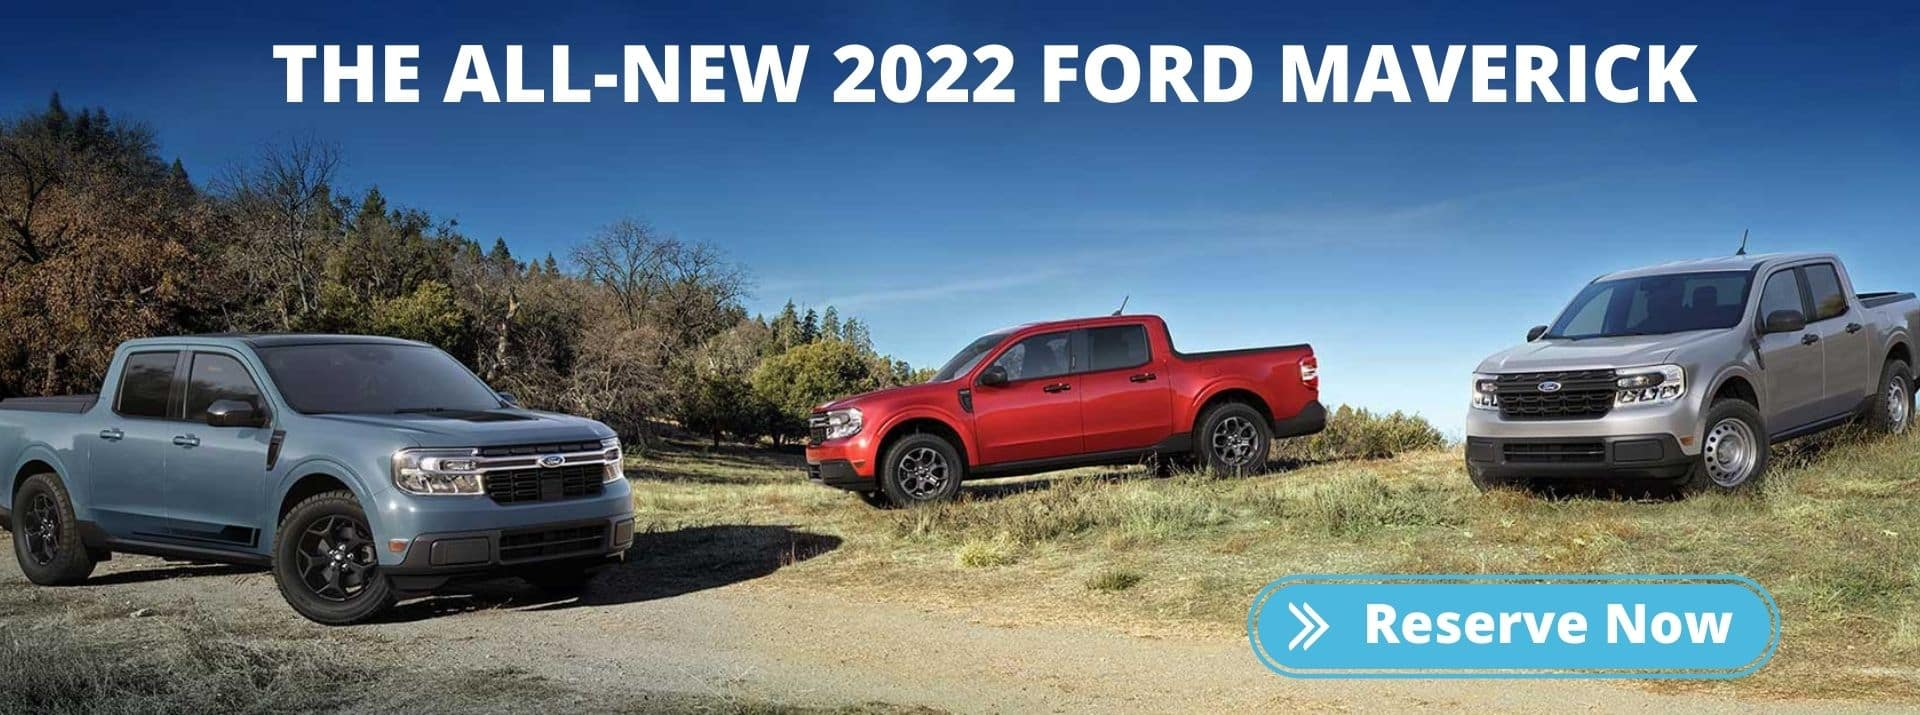 Ford Maverick_Reserve Now_3 Mavericks